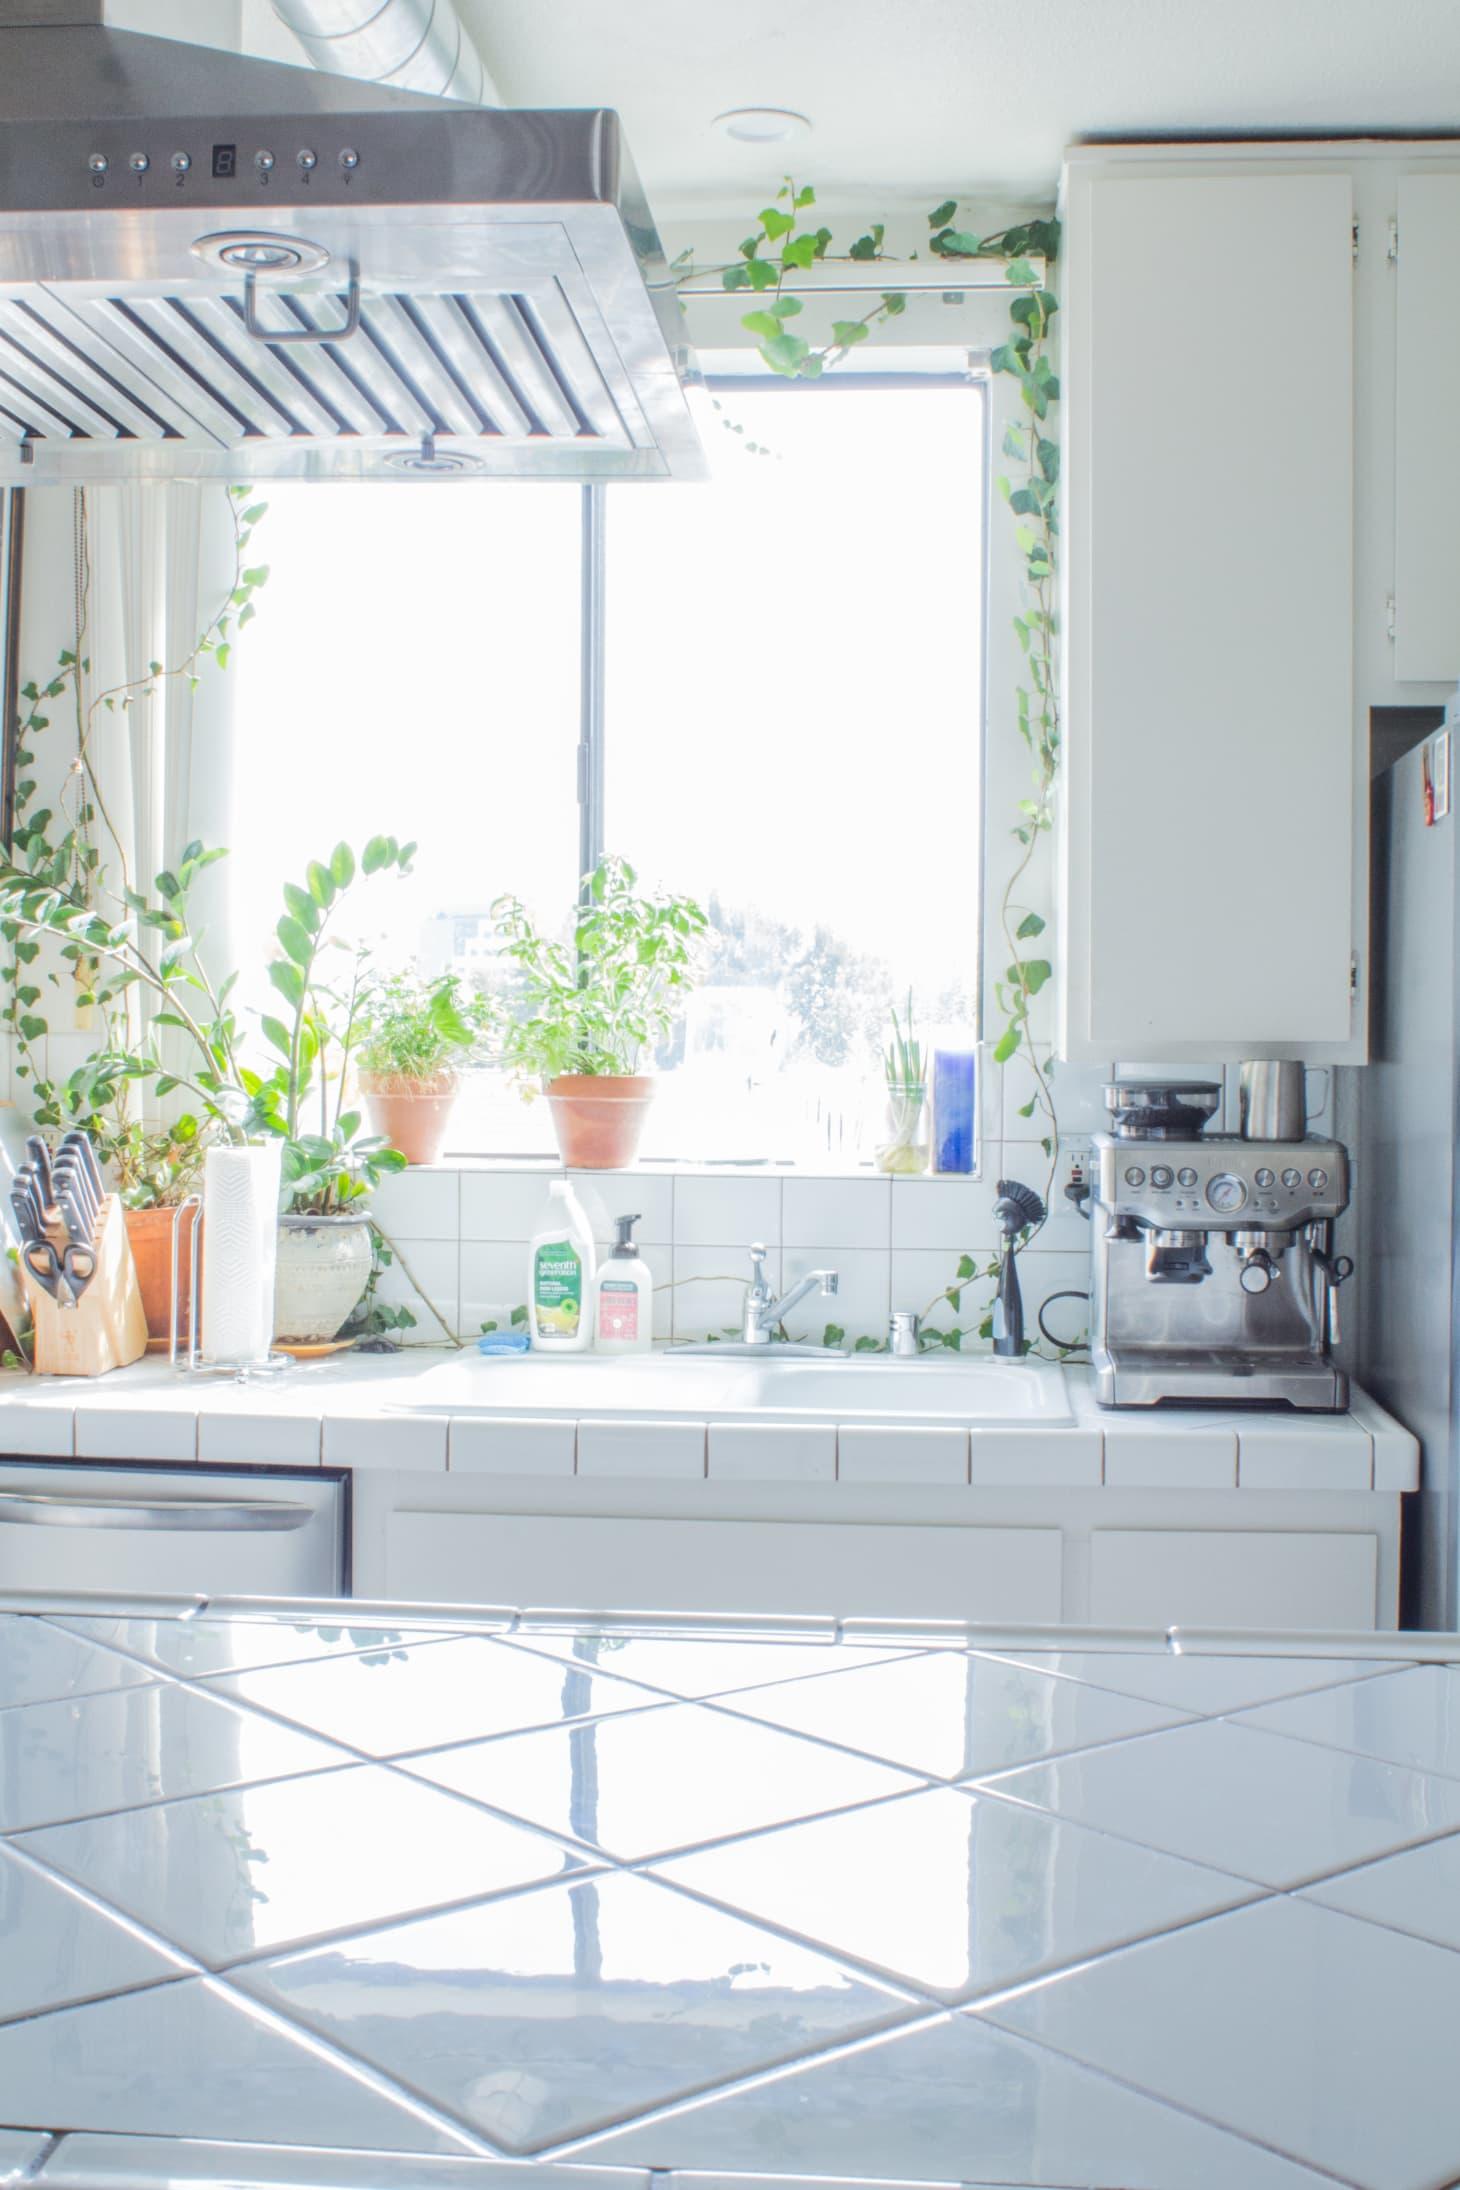 Kitchen Sink Window Decorating Ideas | Apartment Therapy on ideas for kitchens design, ideas for kitchens art, ideas for kitchens paint, ideas for kitchens plumbing,